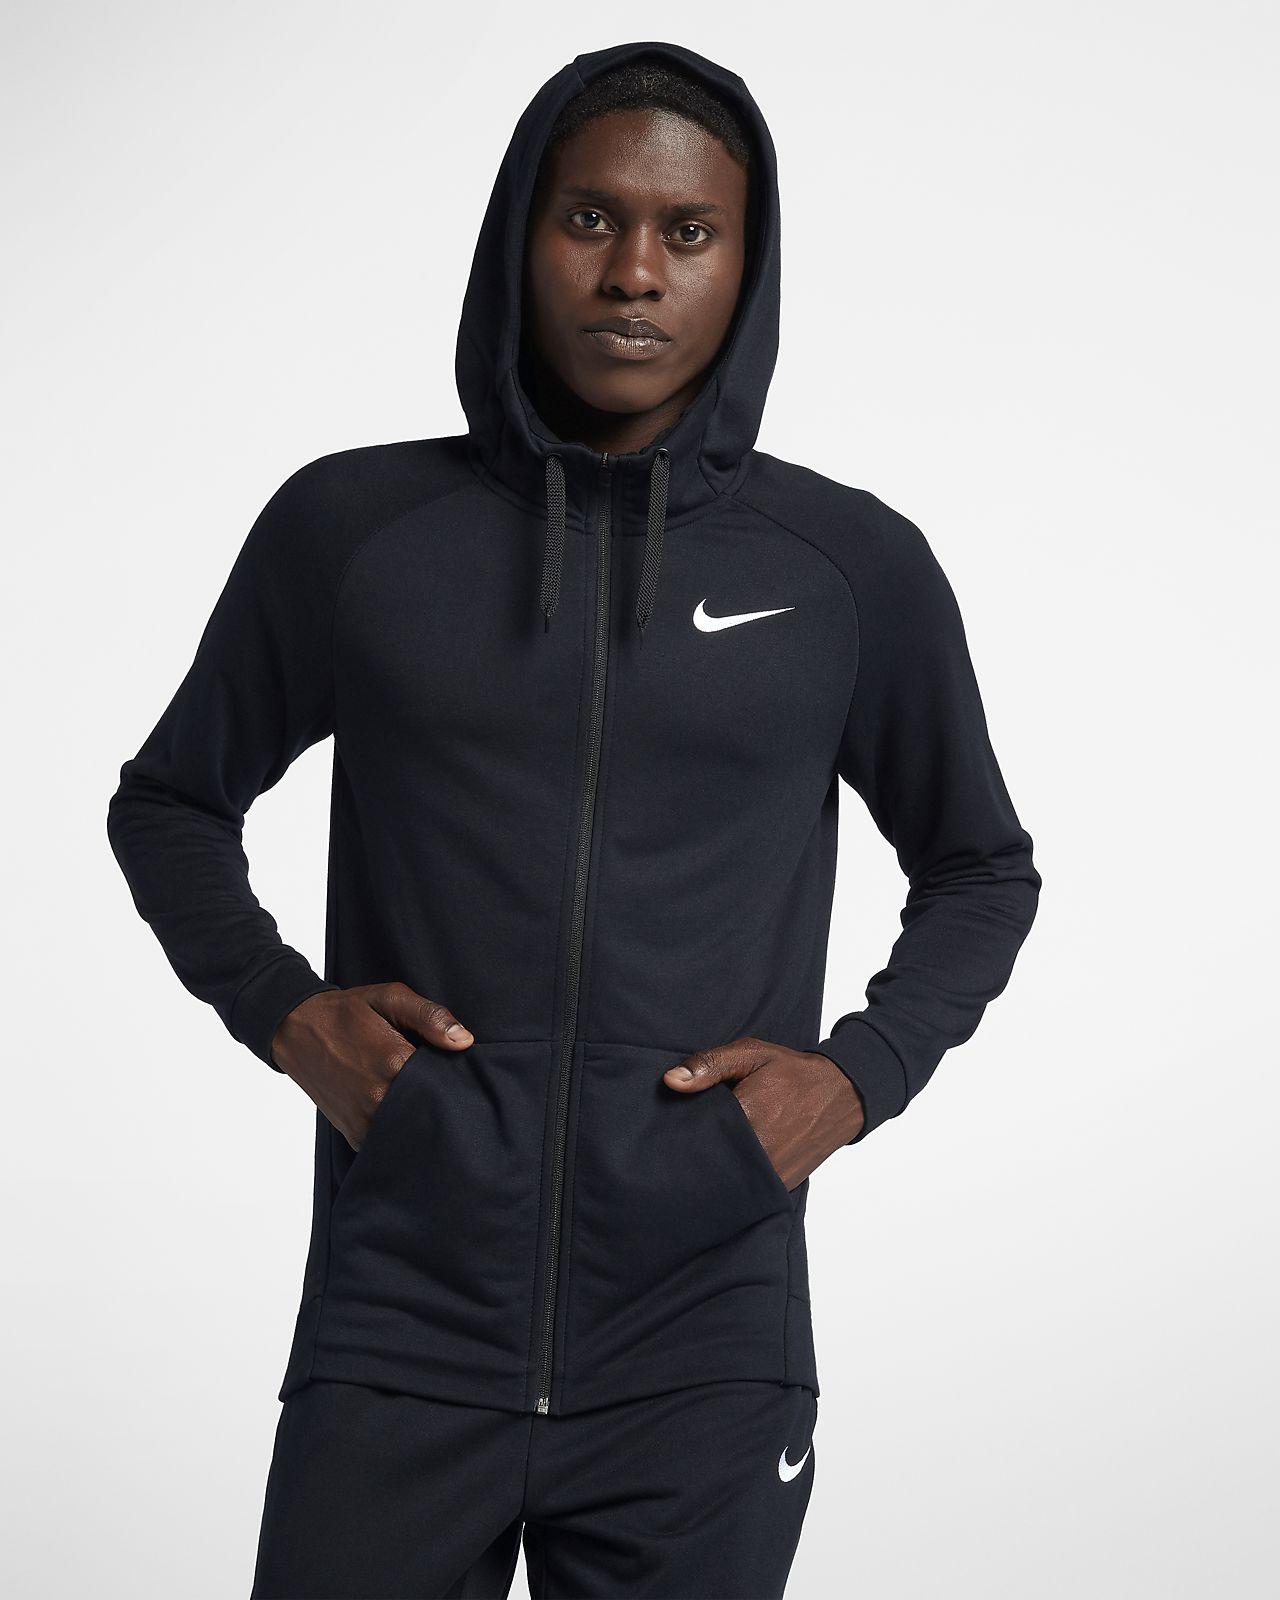 Nike Dri FIT Men's Full Zip Training Hoodie